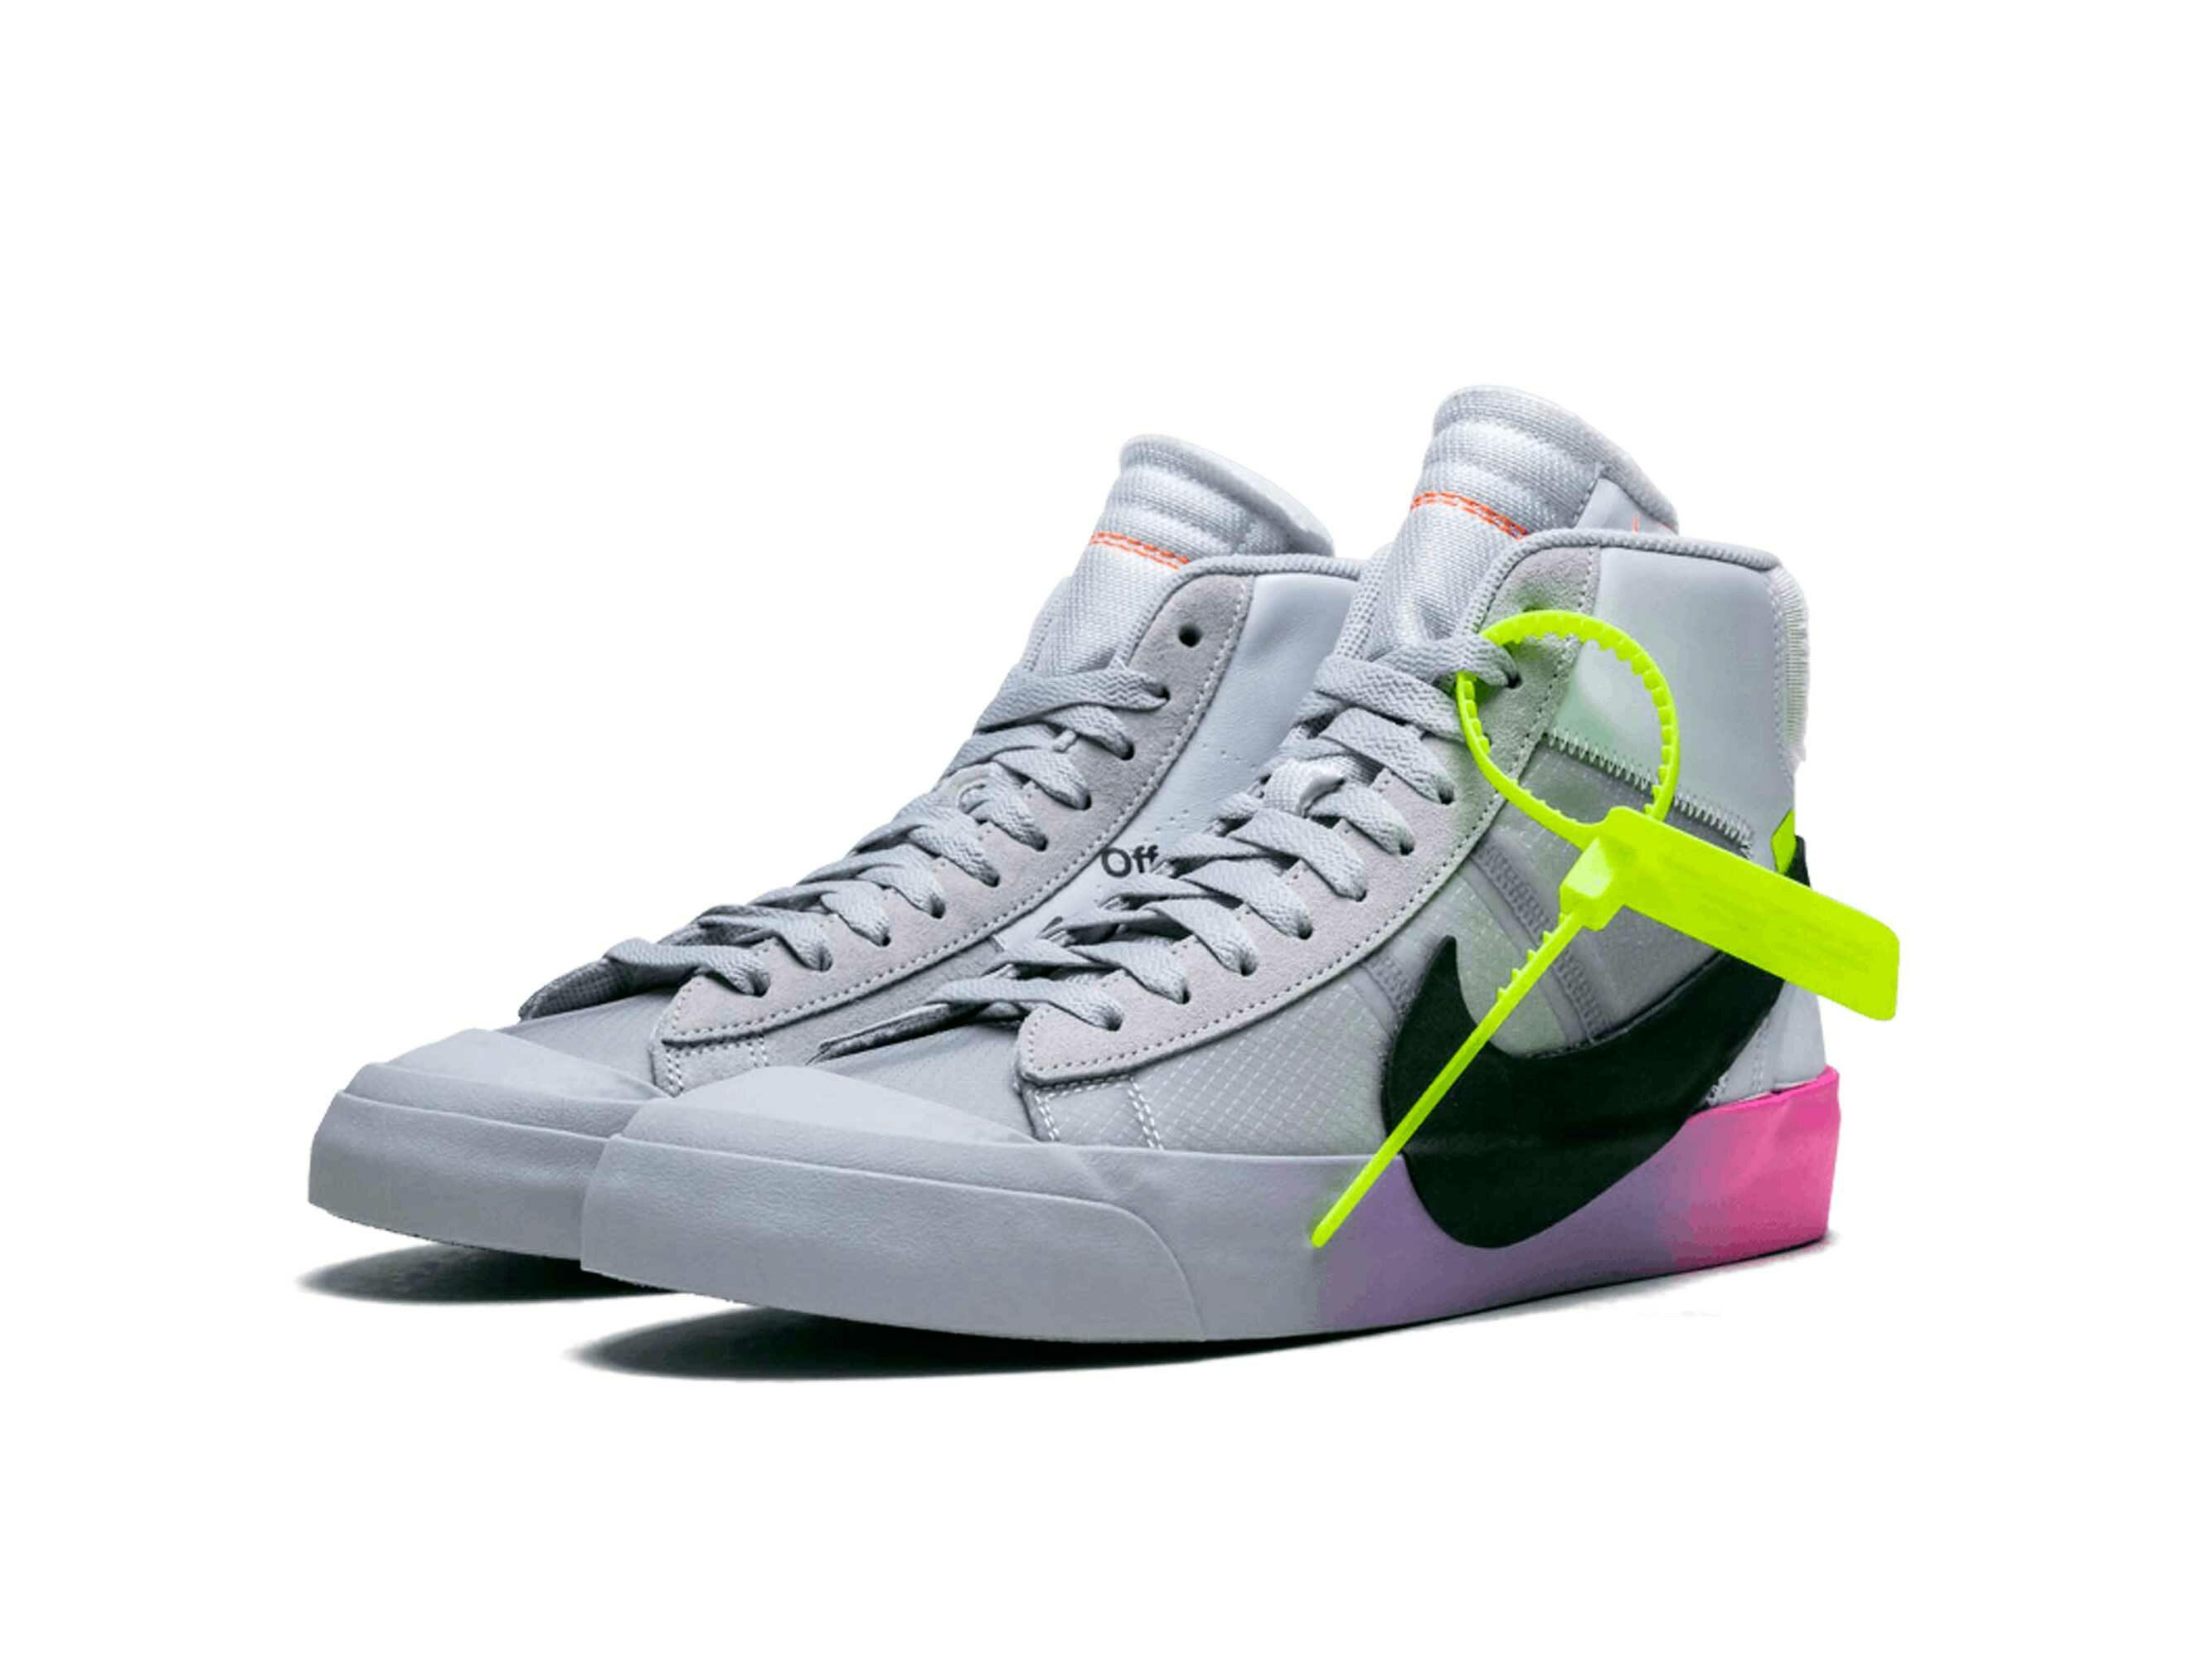 nike blazer mid The Serena Williams x Off White x Nike Blazer Queen AA3832_002 купить